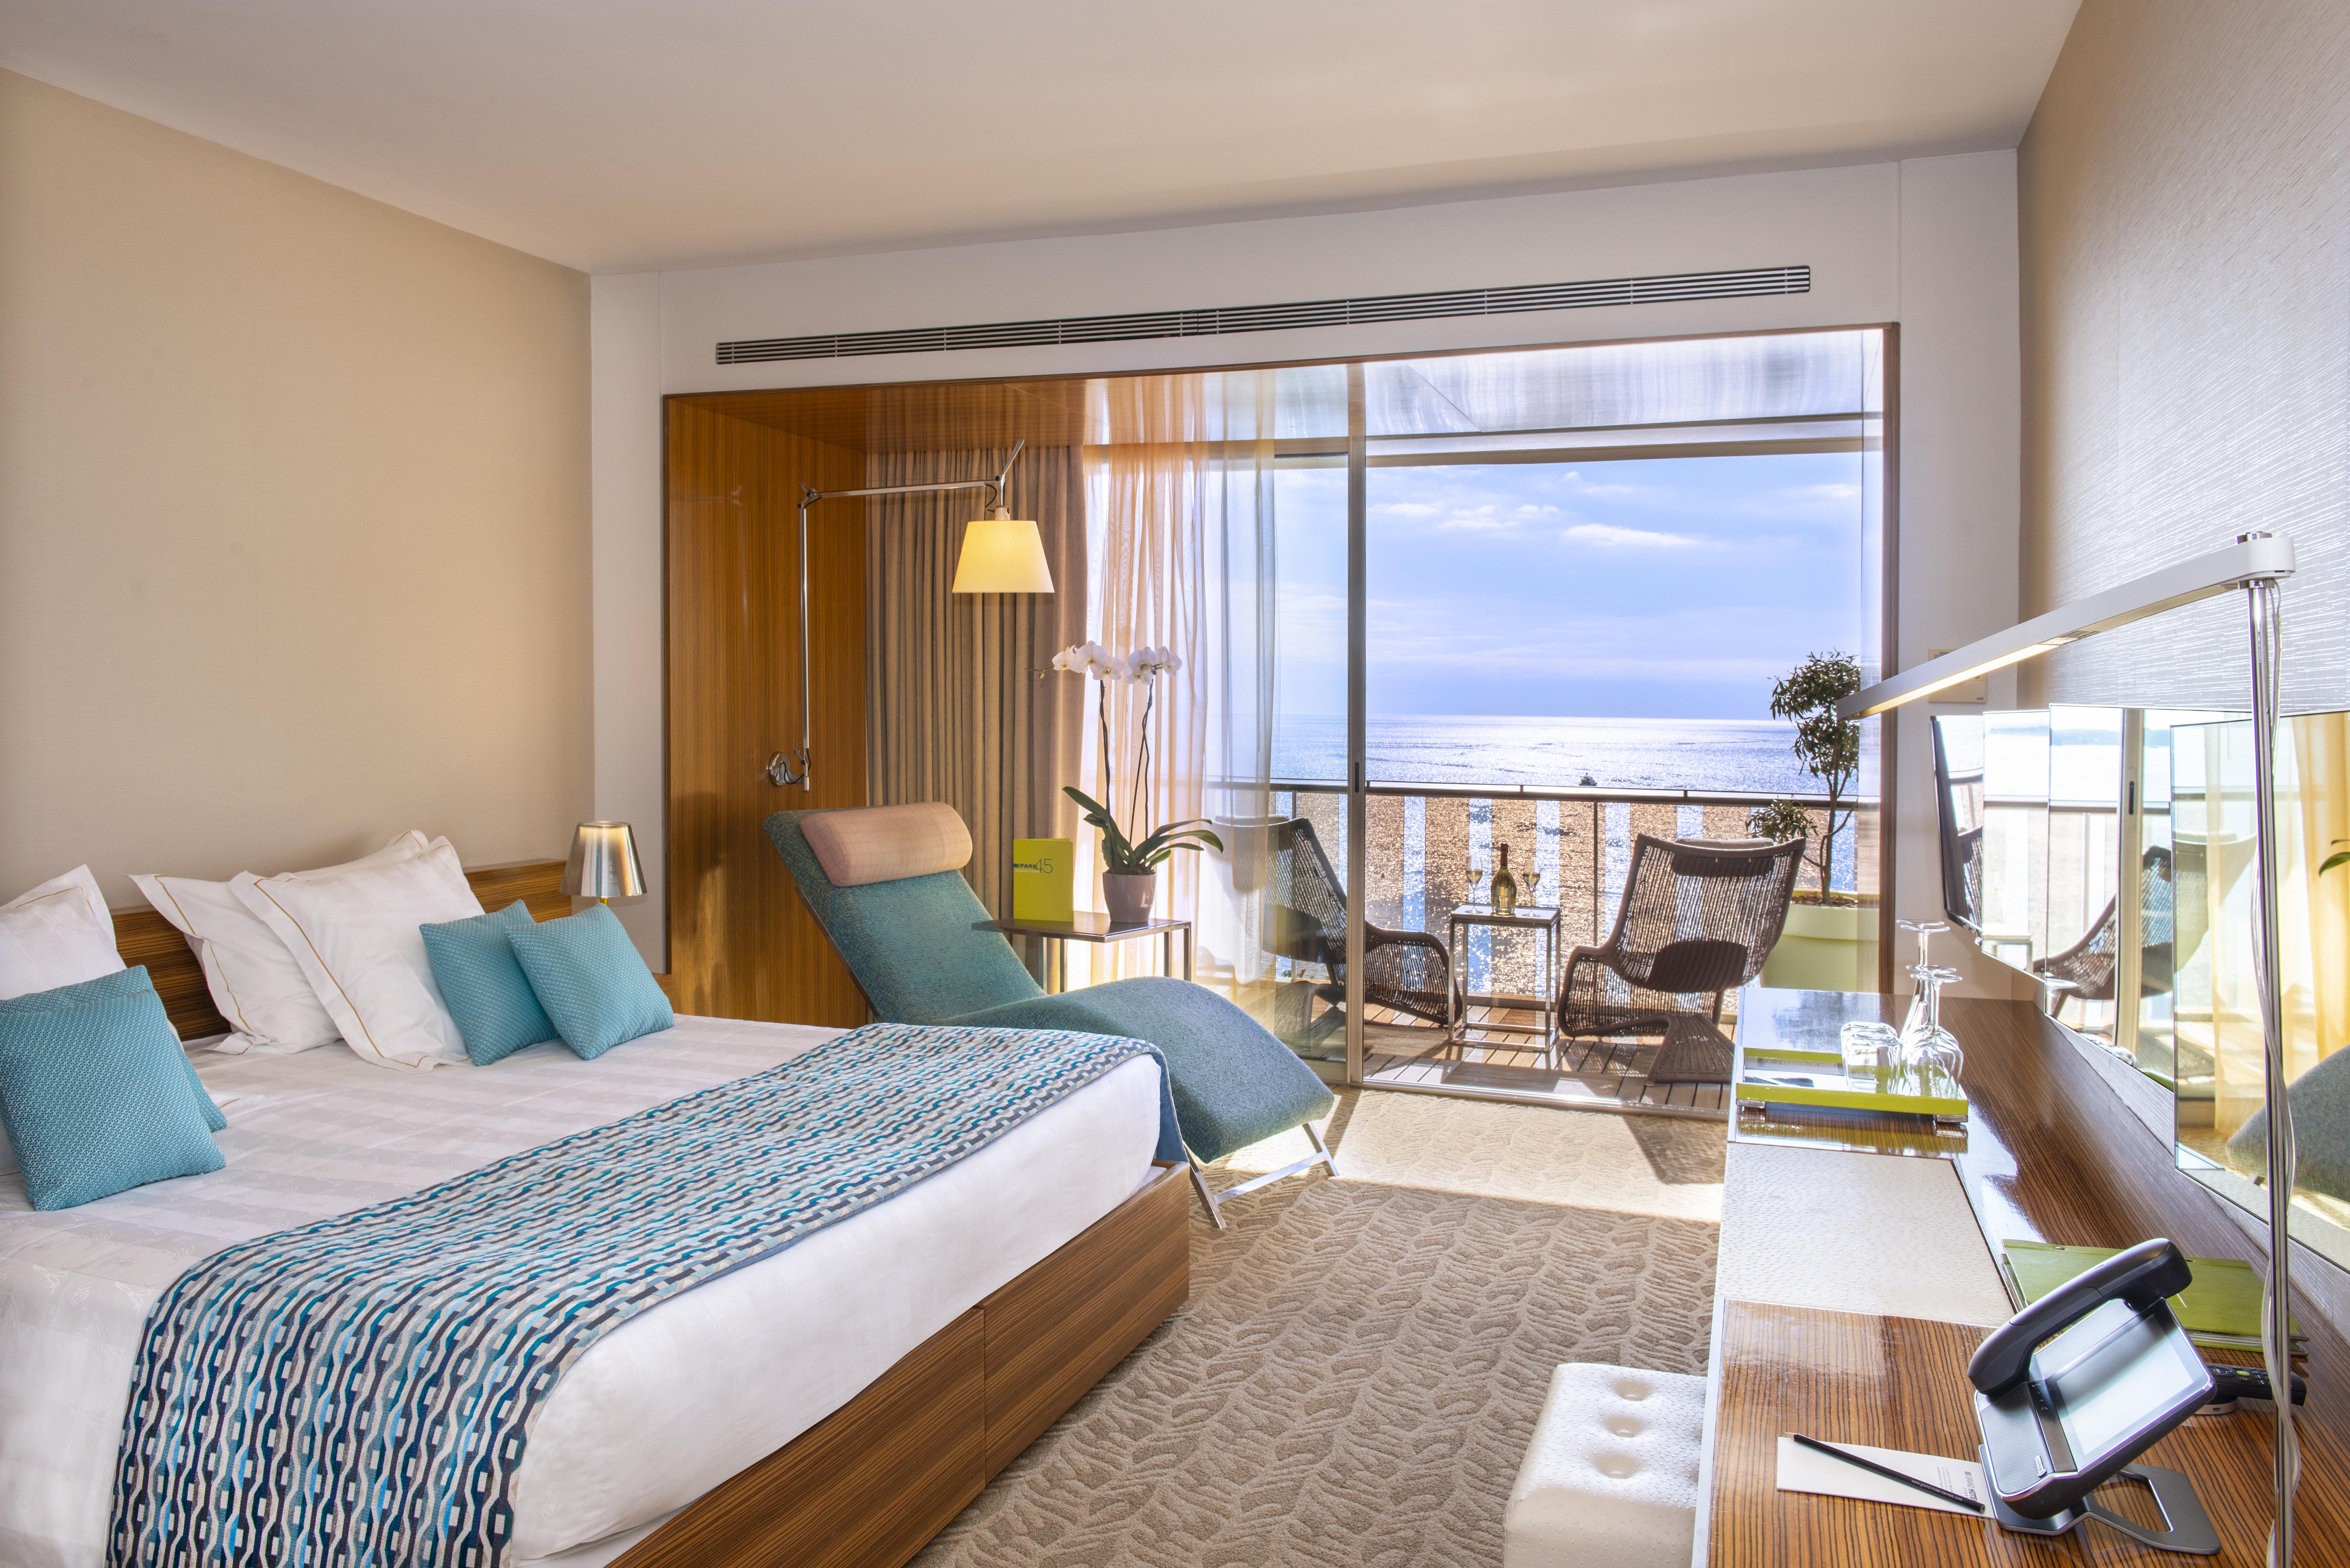 Vauban-Grand-Hotel-Cannes-fev2019-044.jpg